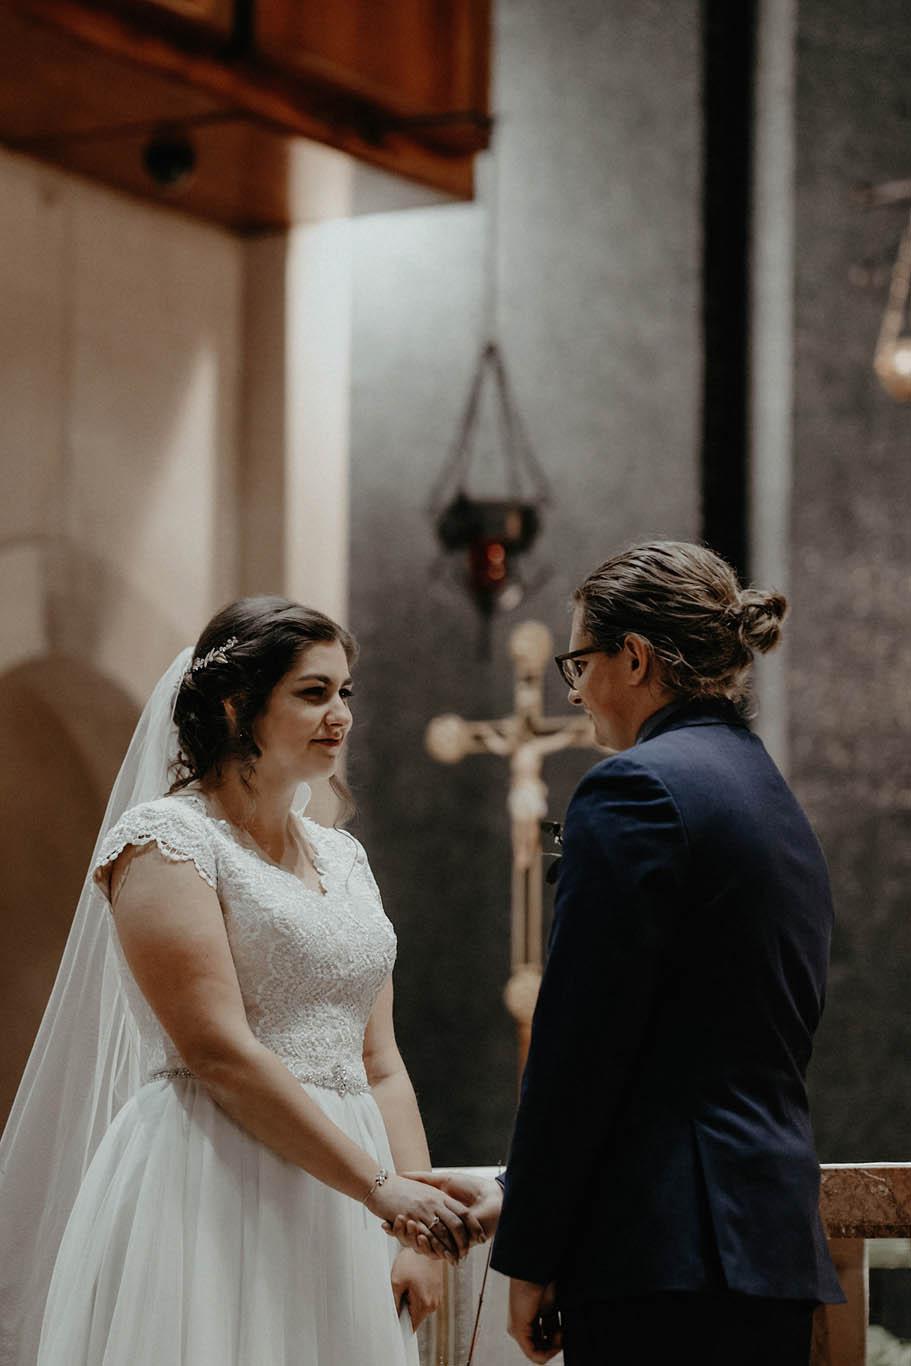 cincinnati warehouse wedding photographer cathedral church ceremony bride smiling